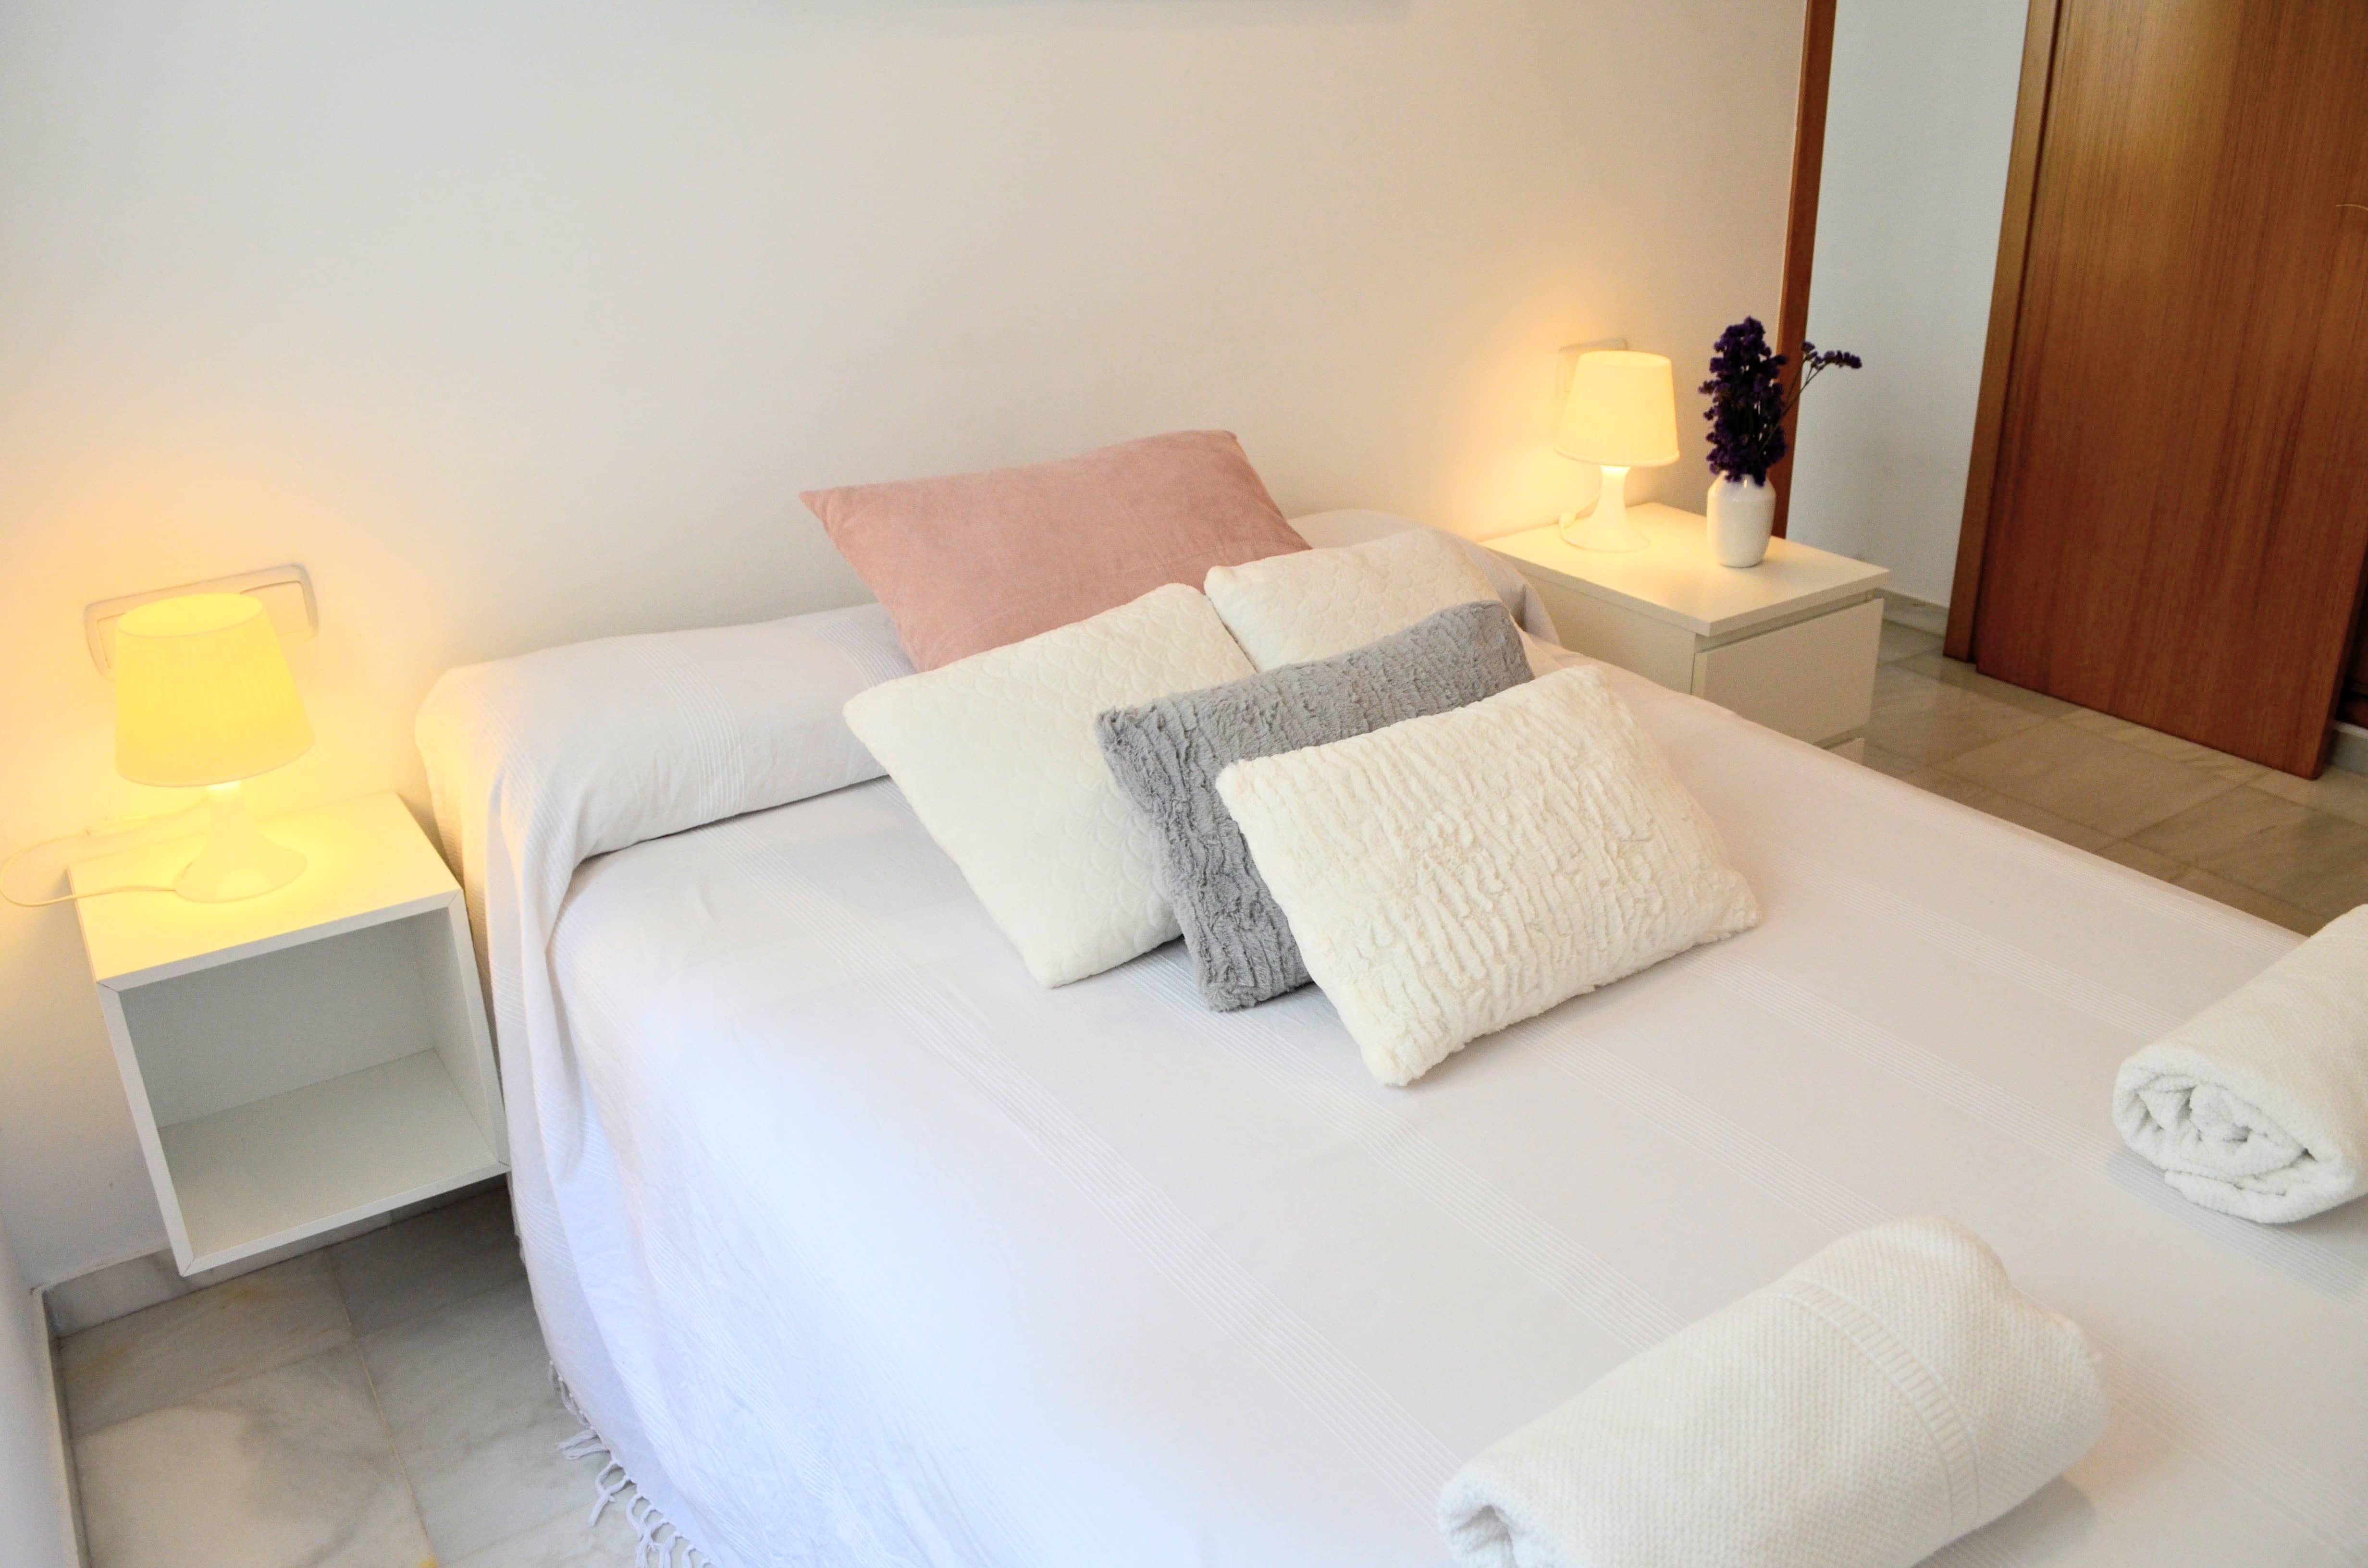 Balneario con dormitorio y terraza privada  0419